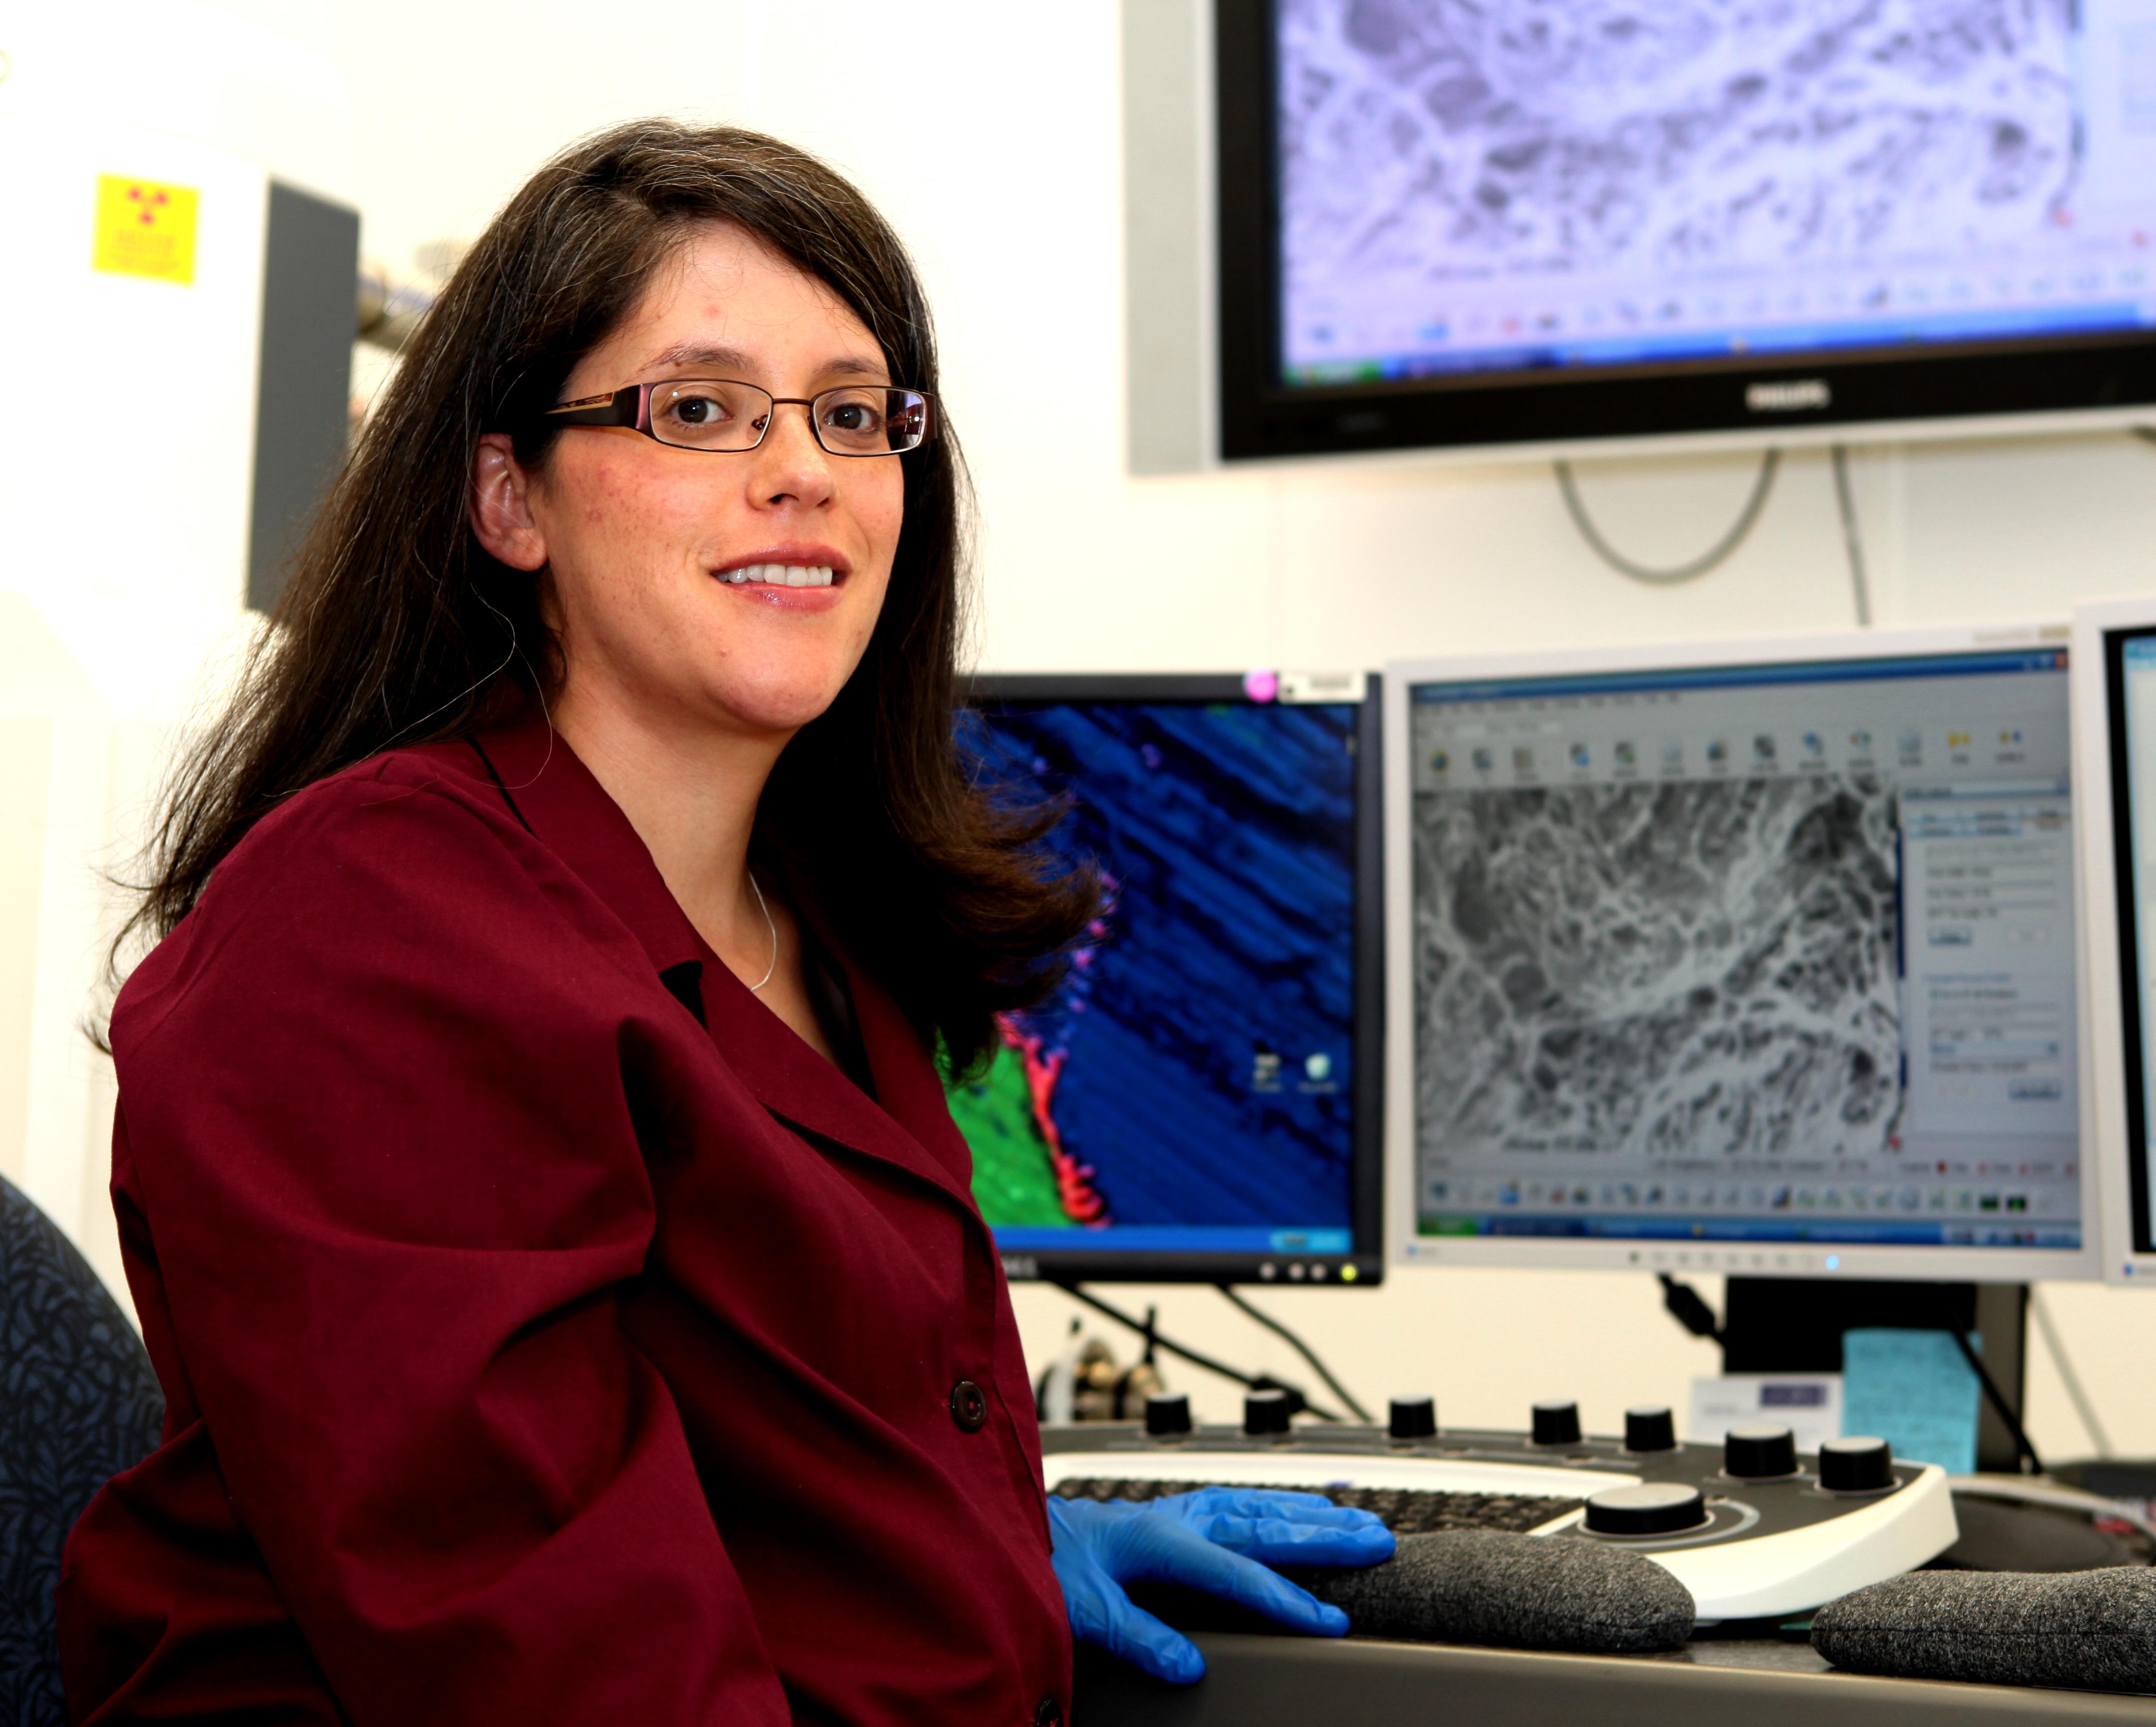 Charlene rivera and dissertation